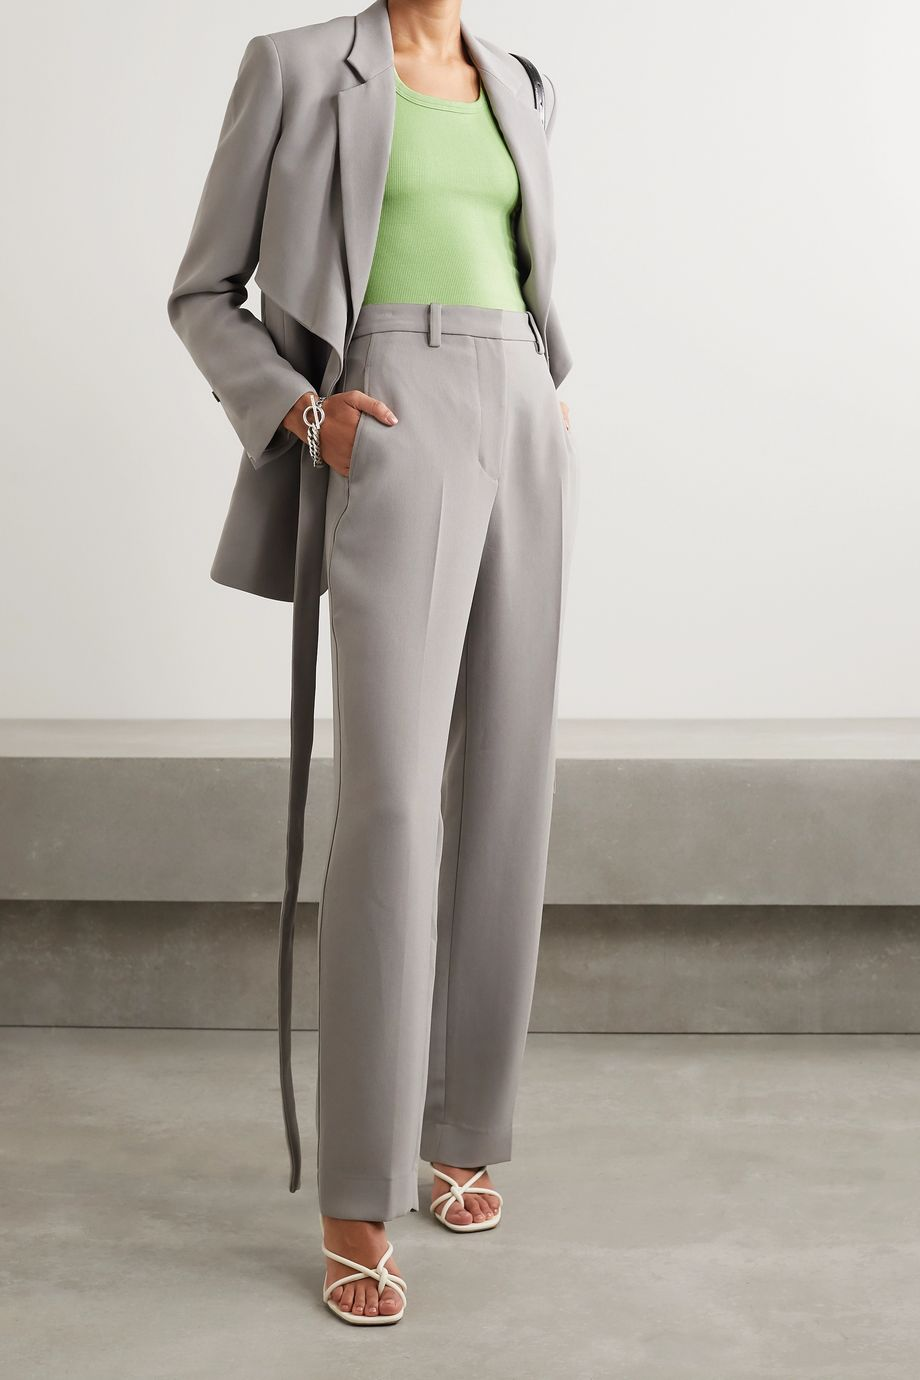 Alix NYC Austin ribbed stretch-modal jersey thong bodysuit